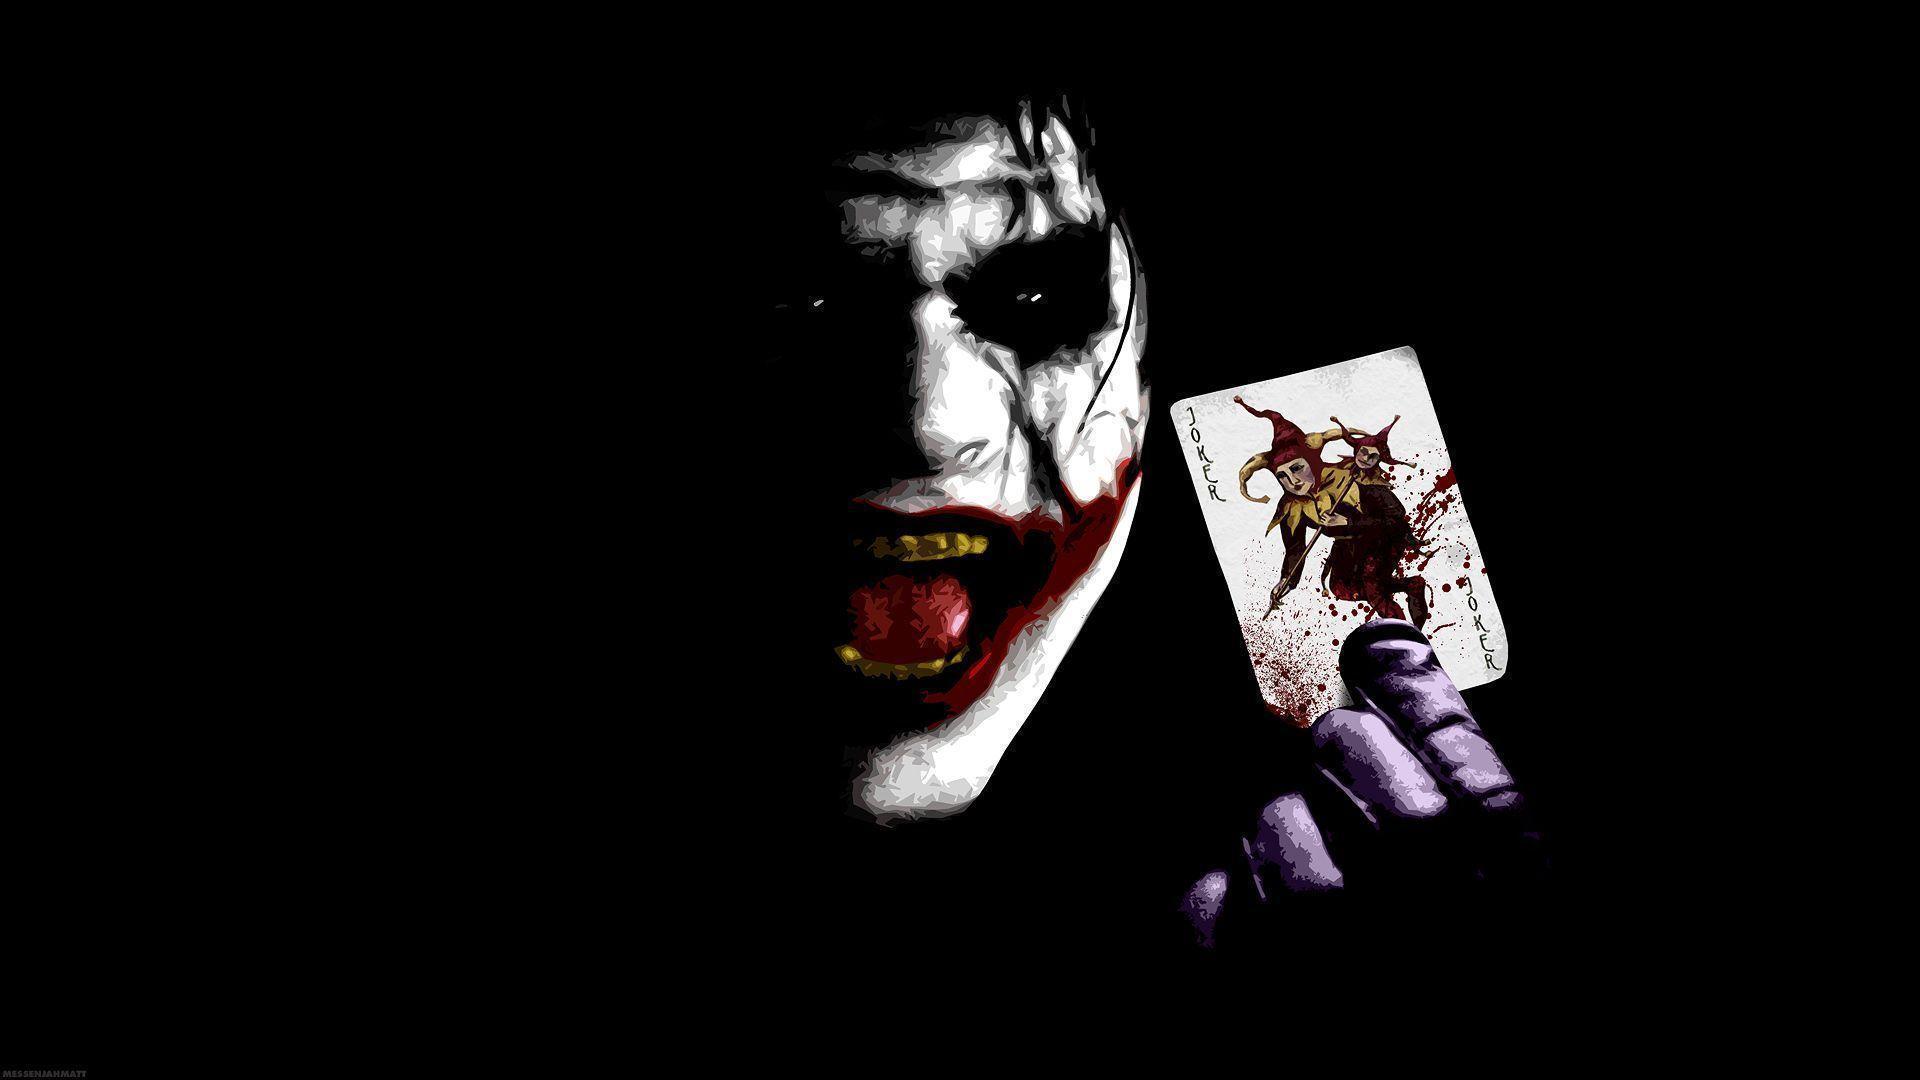 joker batman wallpapers - wallpaper cave